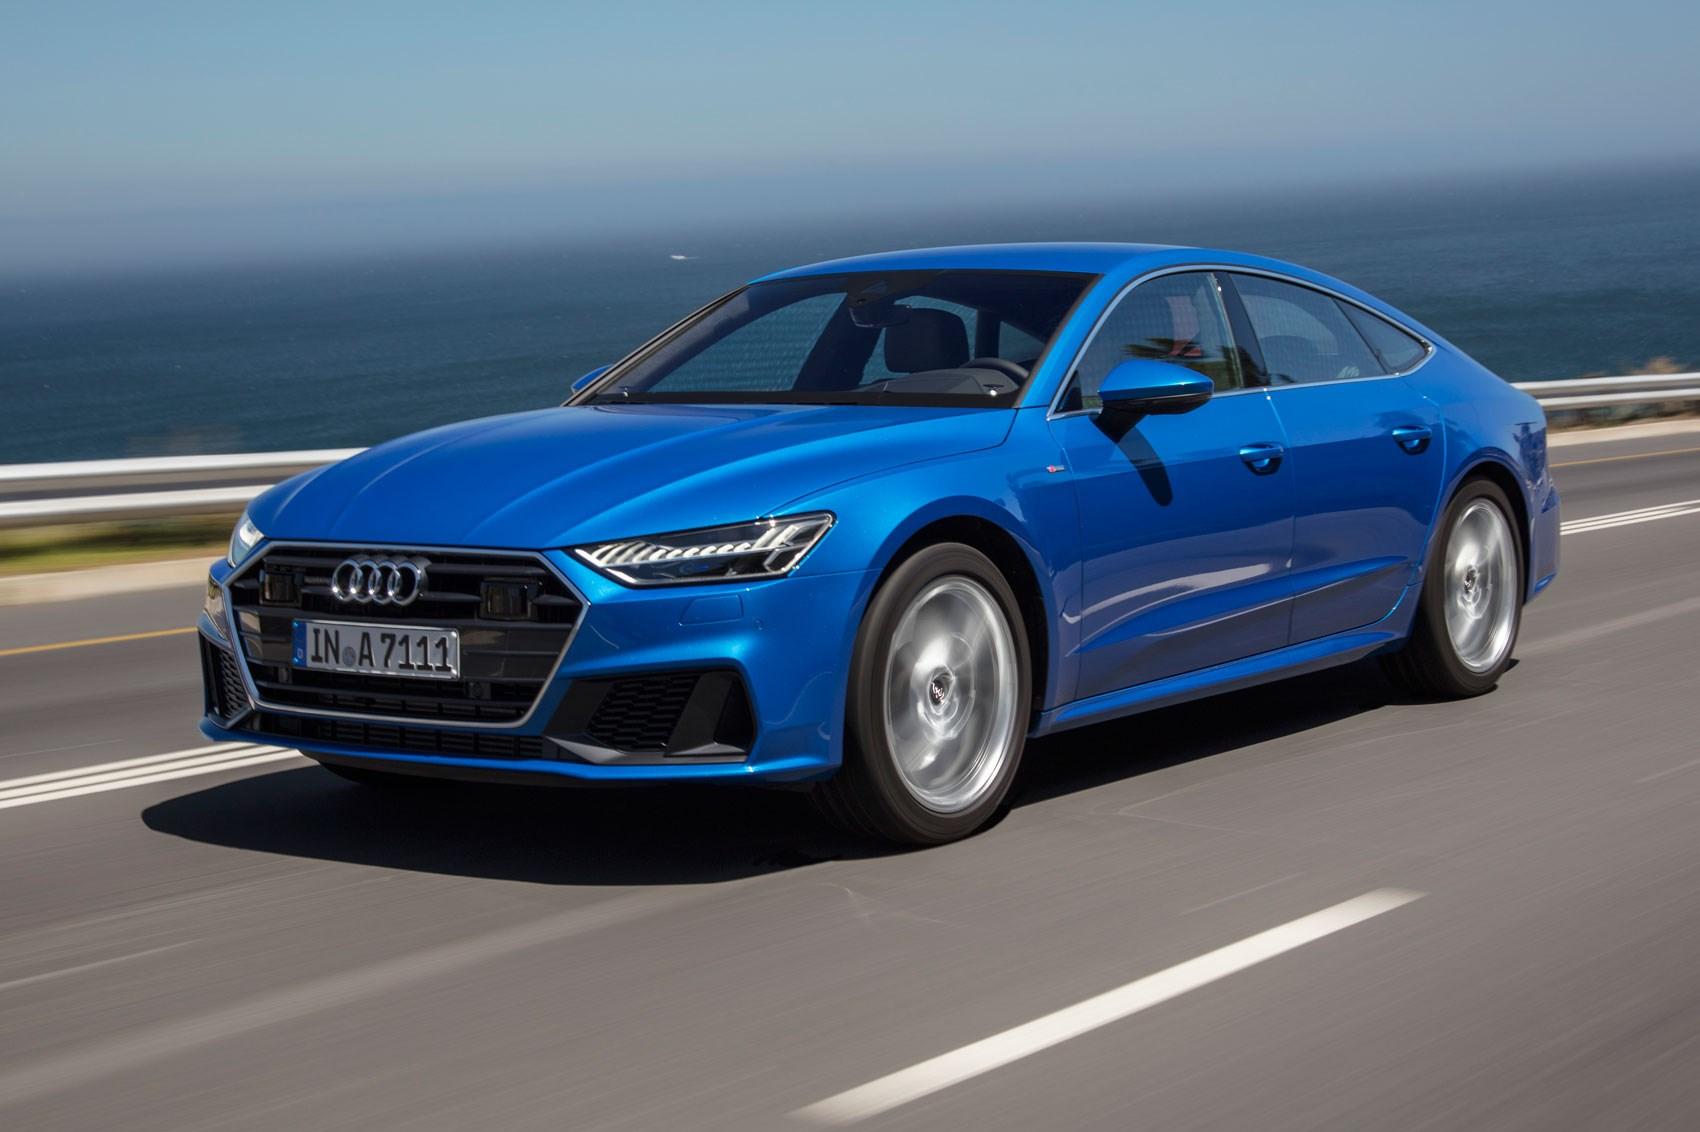 New Audi A7 (2018) review: the sleek exec driven   CAR Magazine